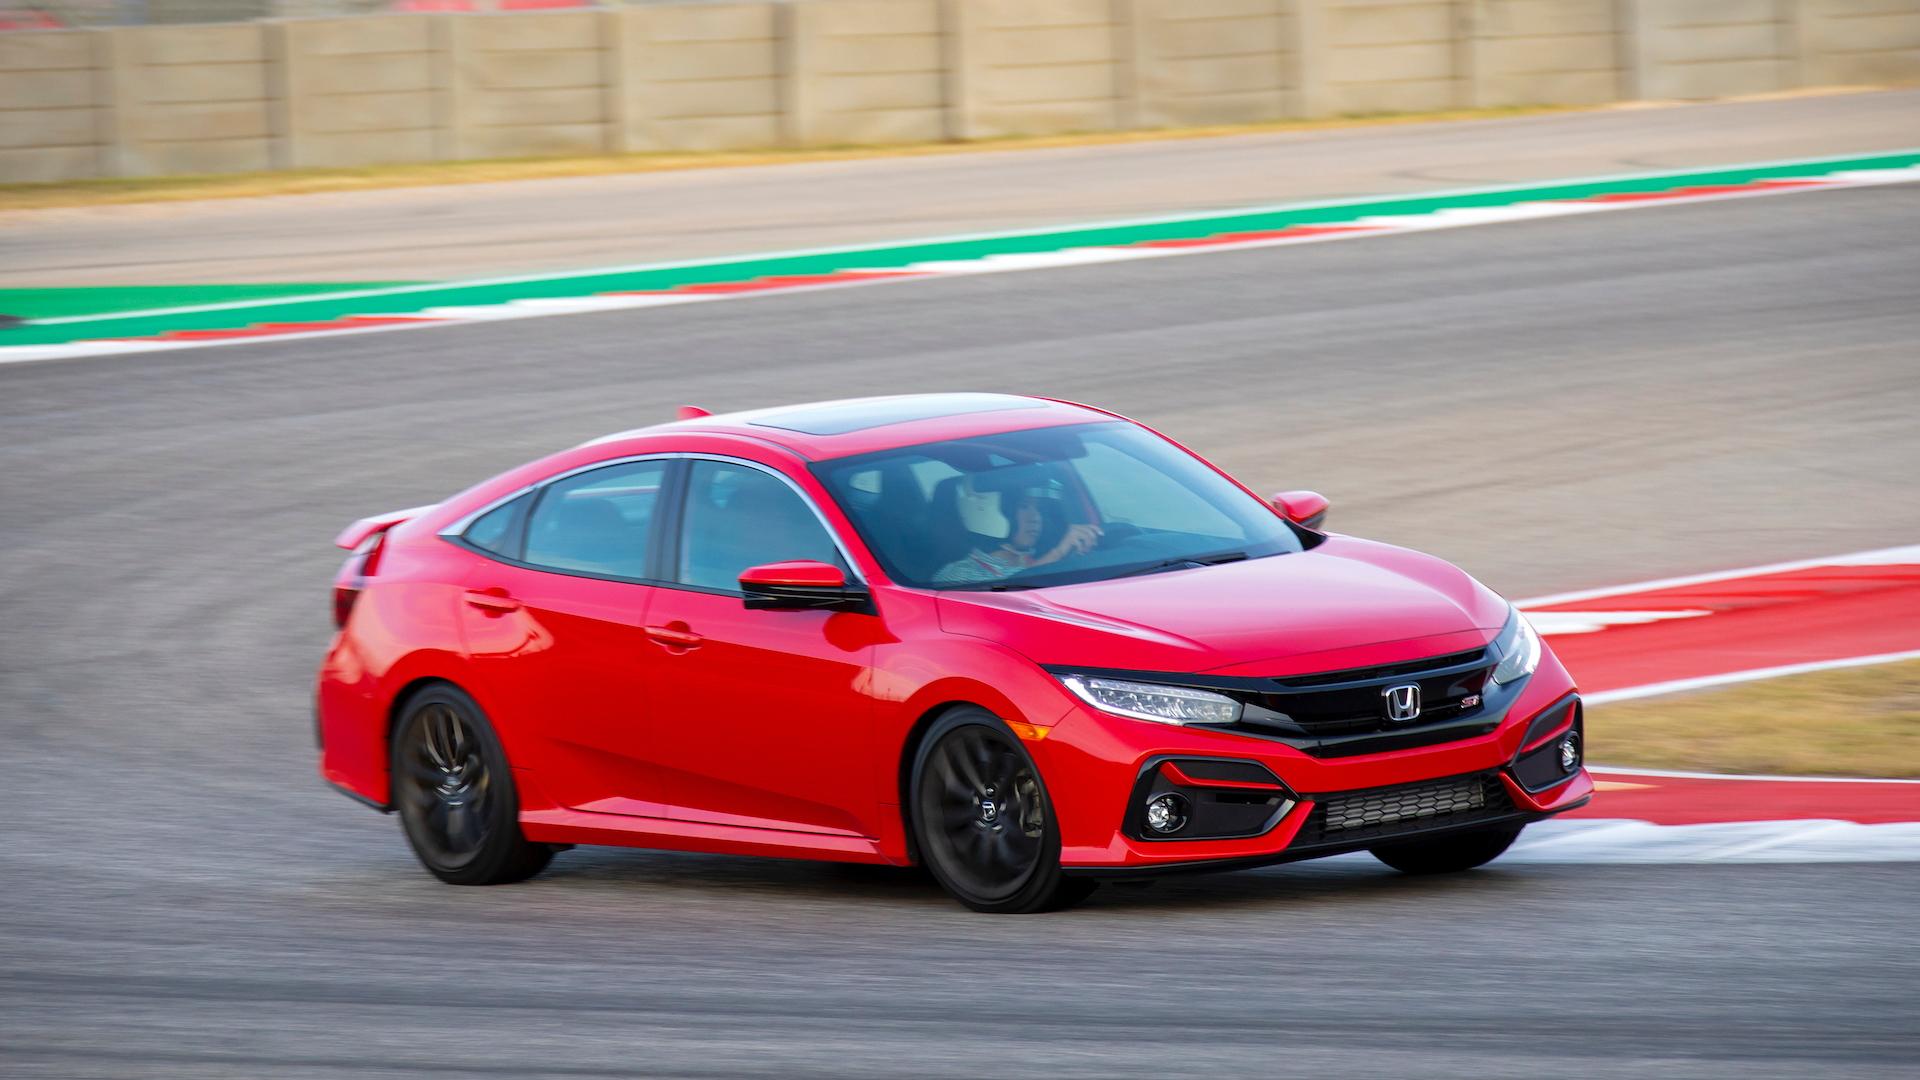 2020 Honda Civic Si media drive, Circuit of the Americas, November, 2019